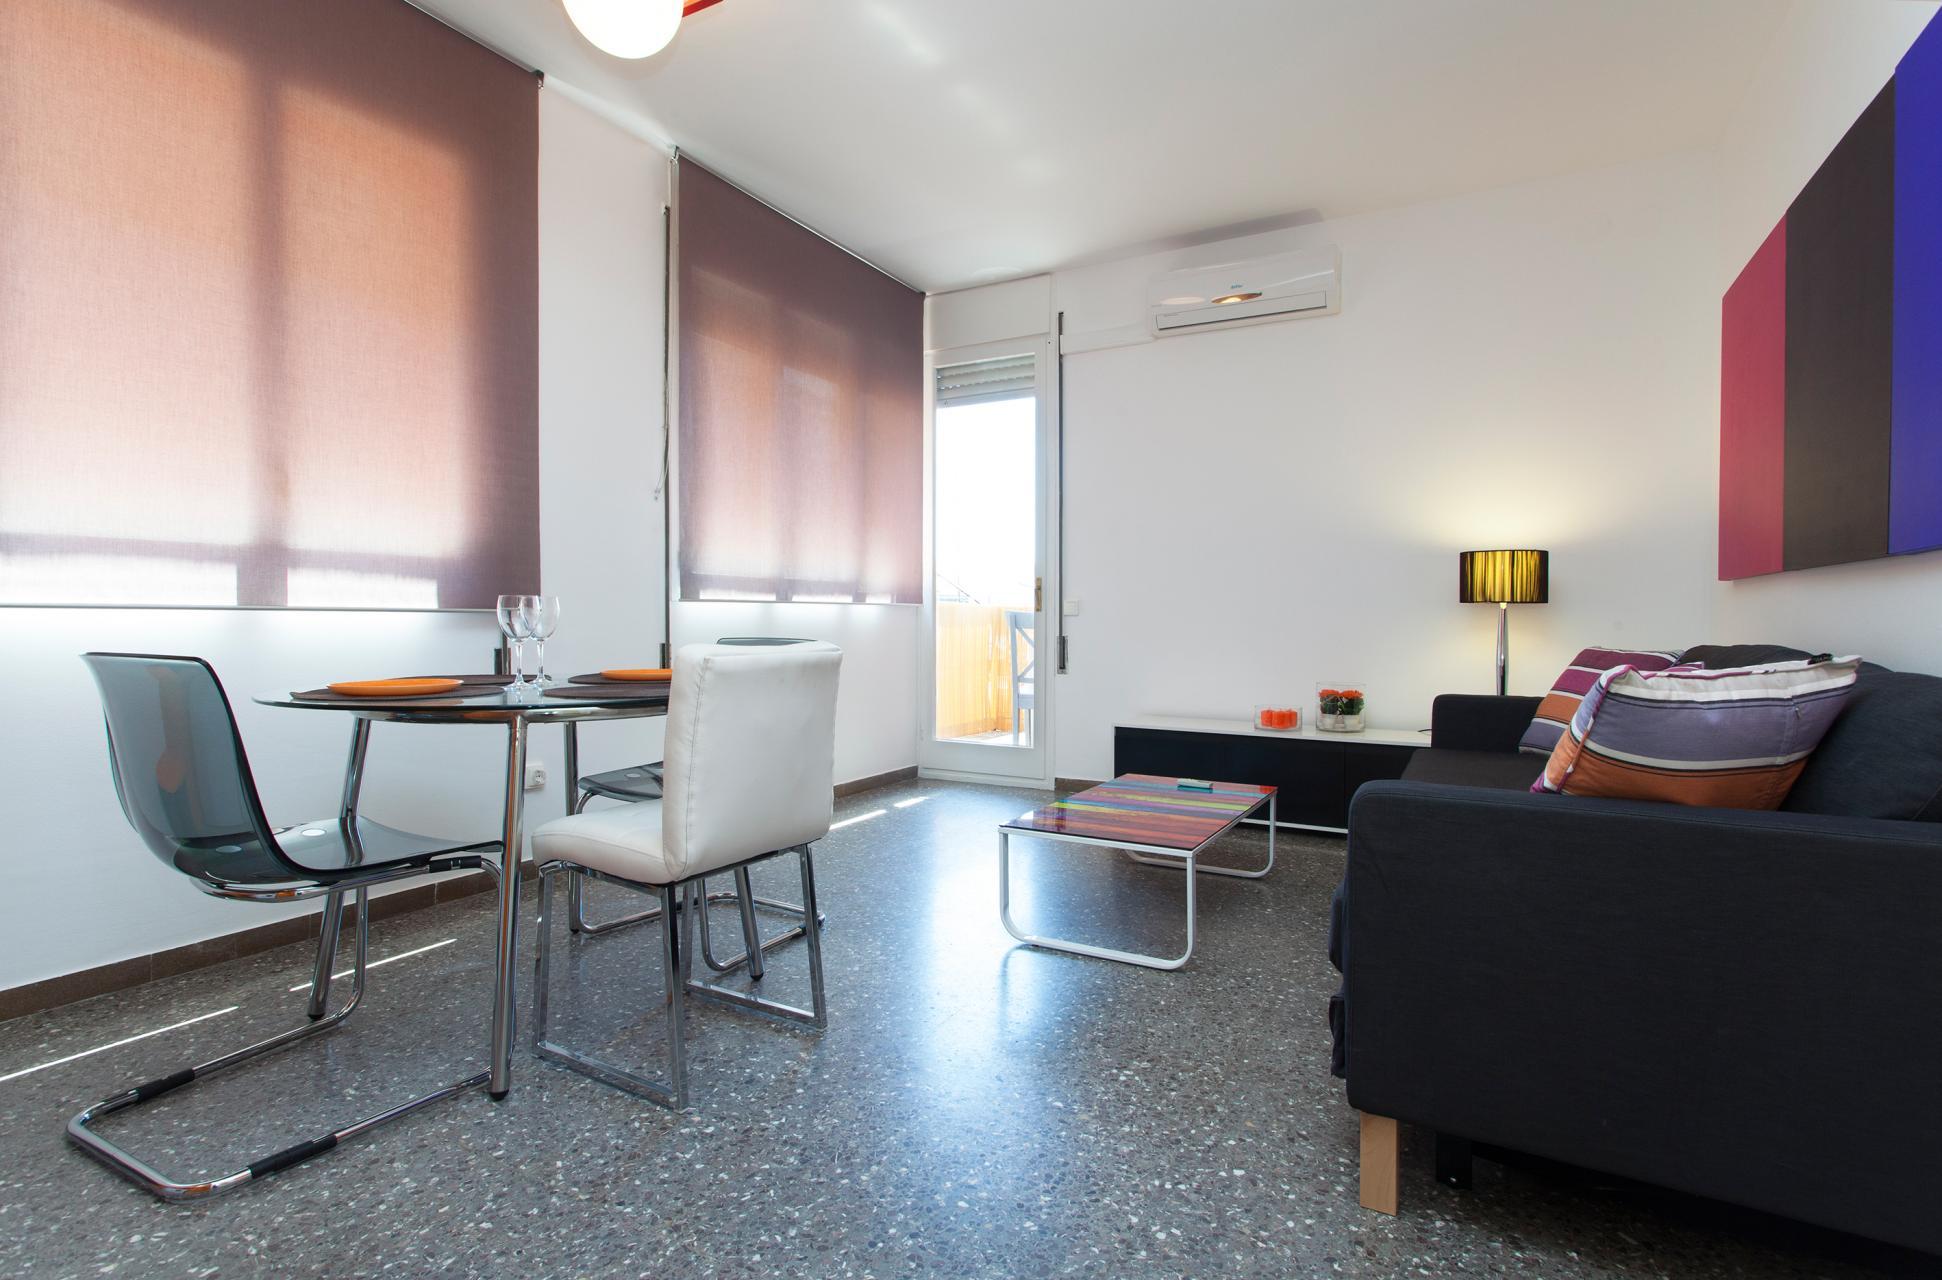 Piso en alquiler barcelona l 39 eixample avenida diagonal napols - Alquiler pisos barcelona eixample ...